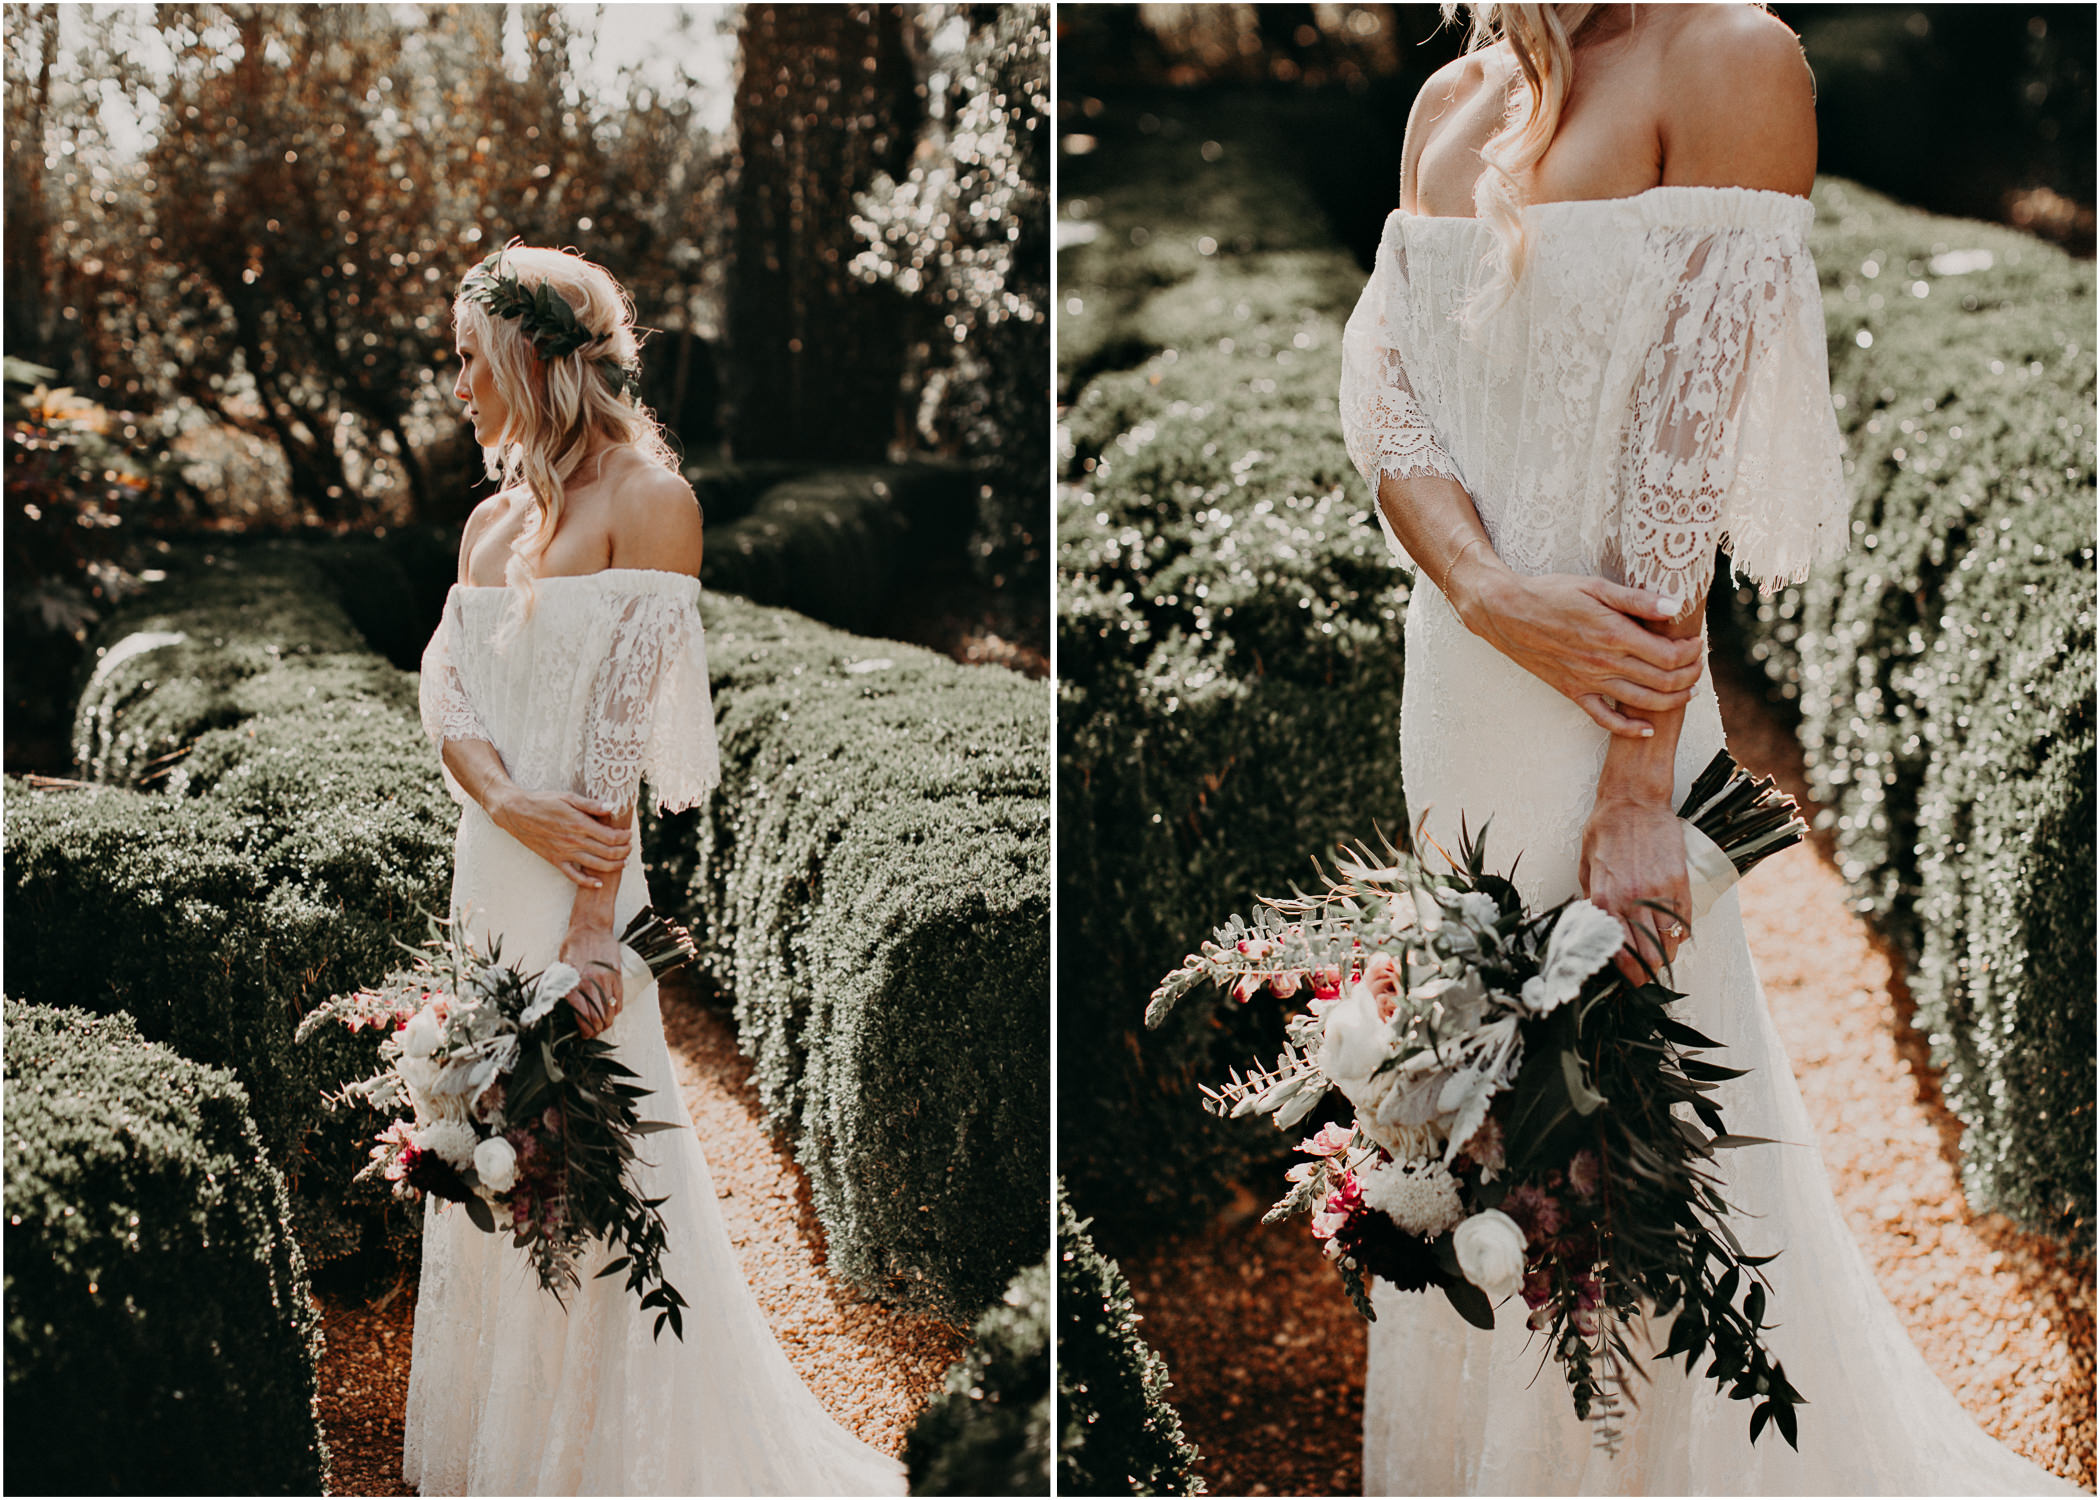 15 - Barnsley Gardens Wedding - Bride portraits - First Look .jpg